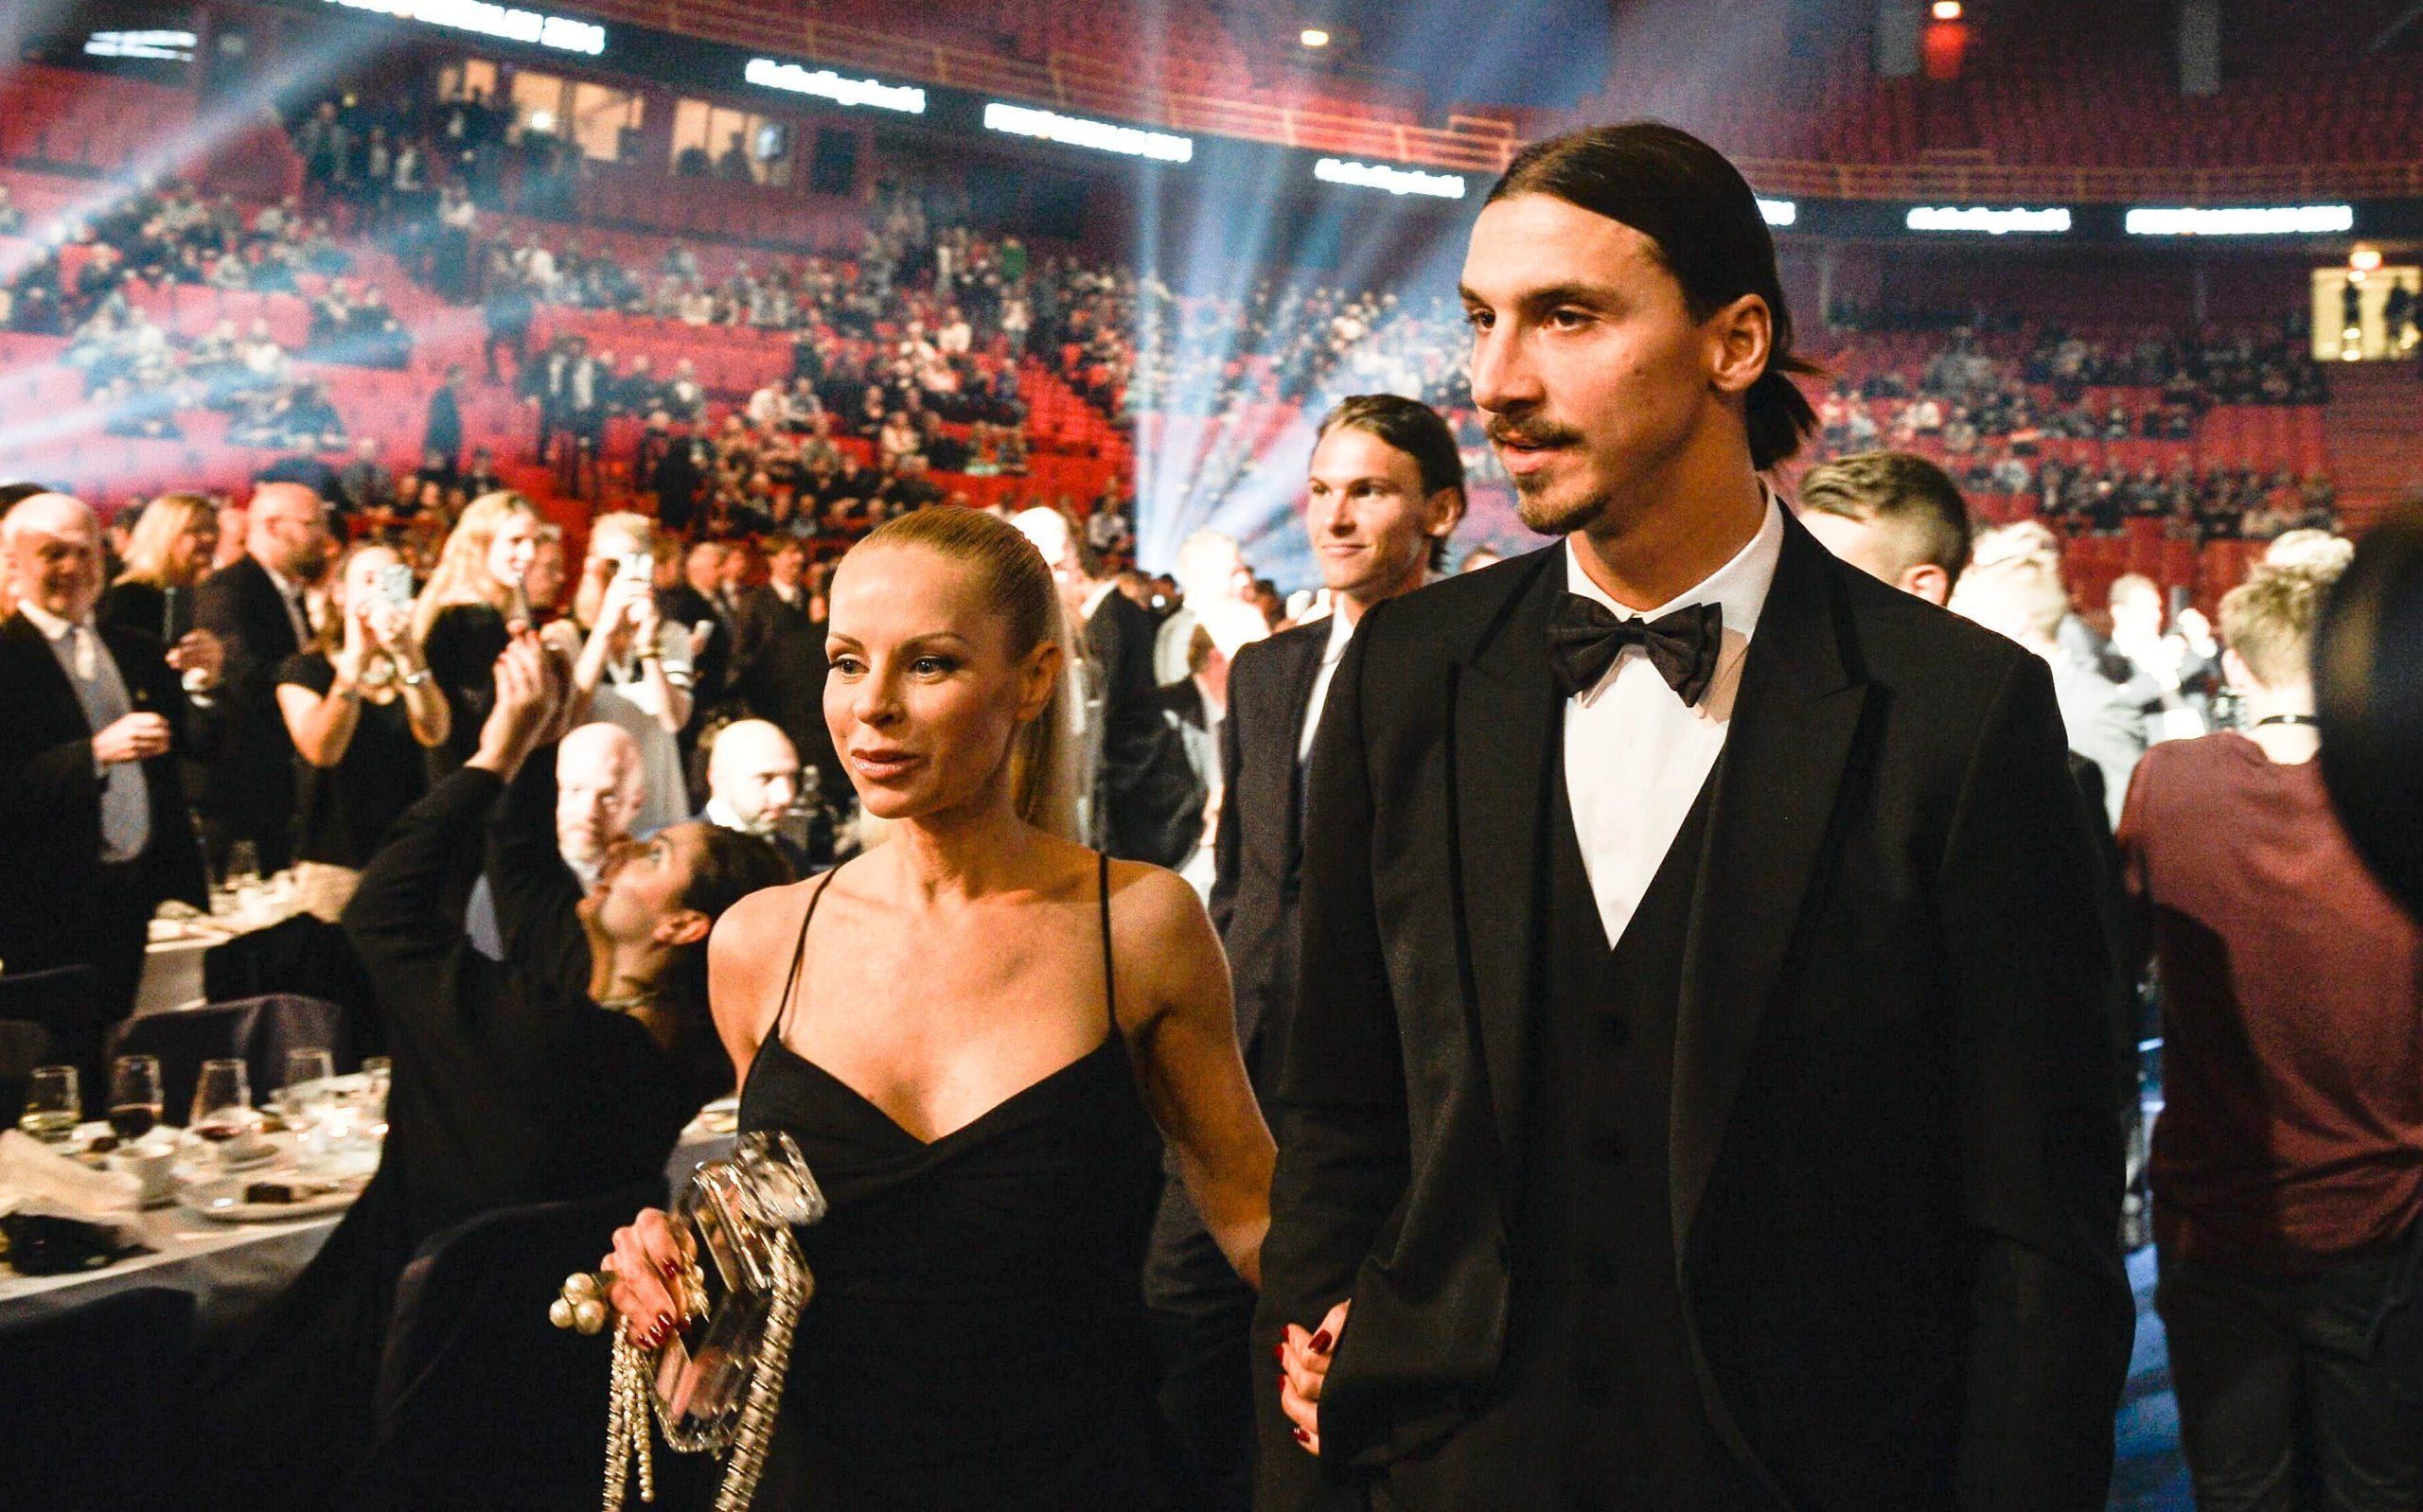 Diletta Leotta e Zlatan Ibrahimovic